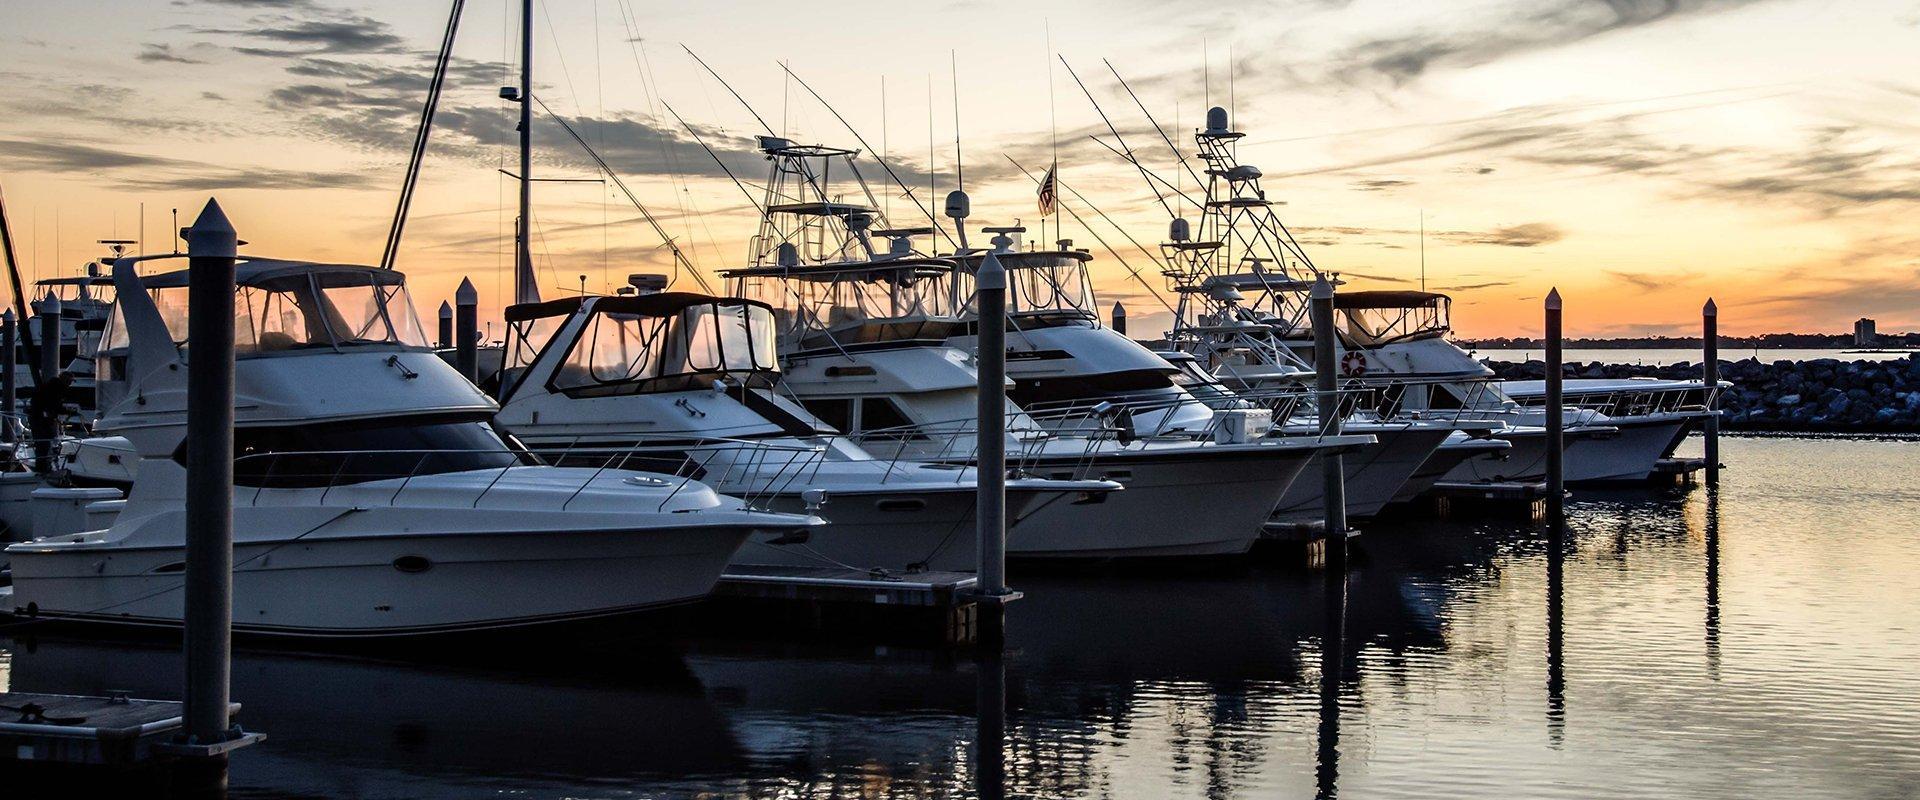 boat harbor